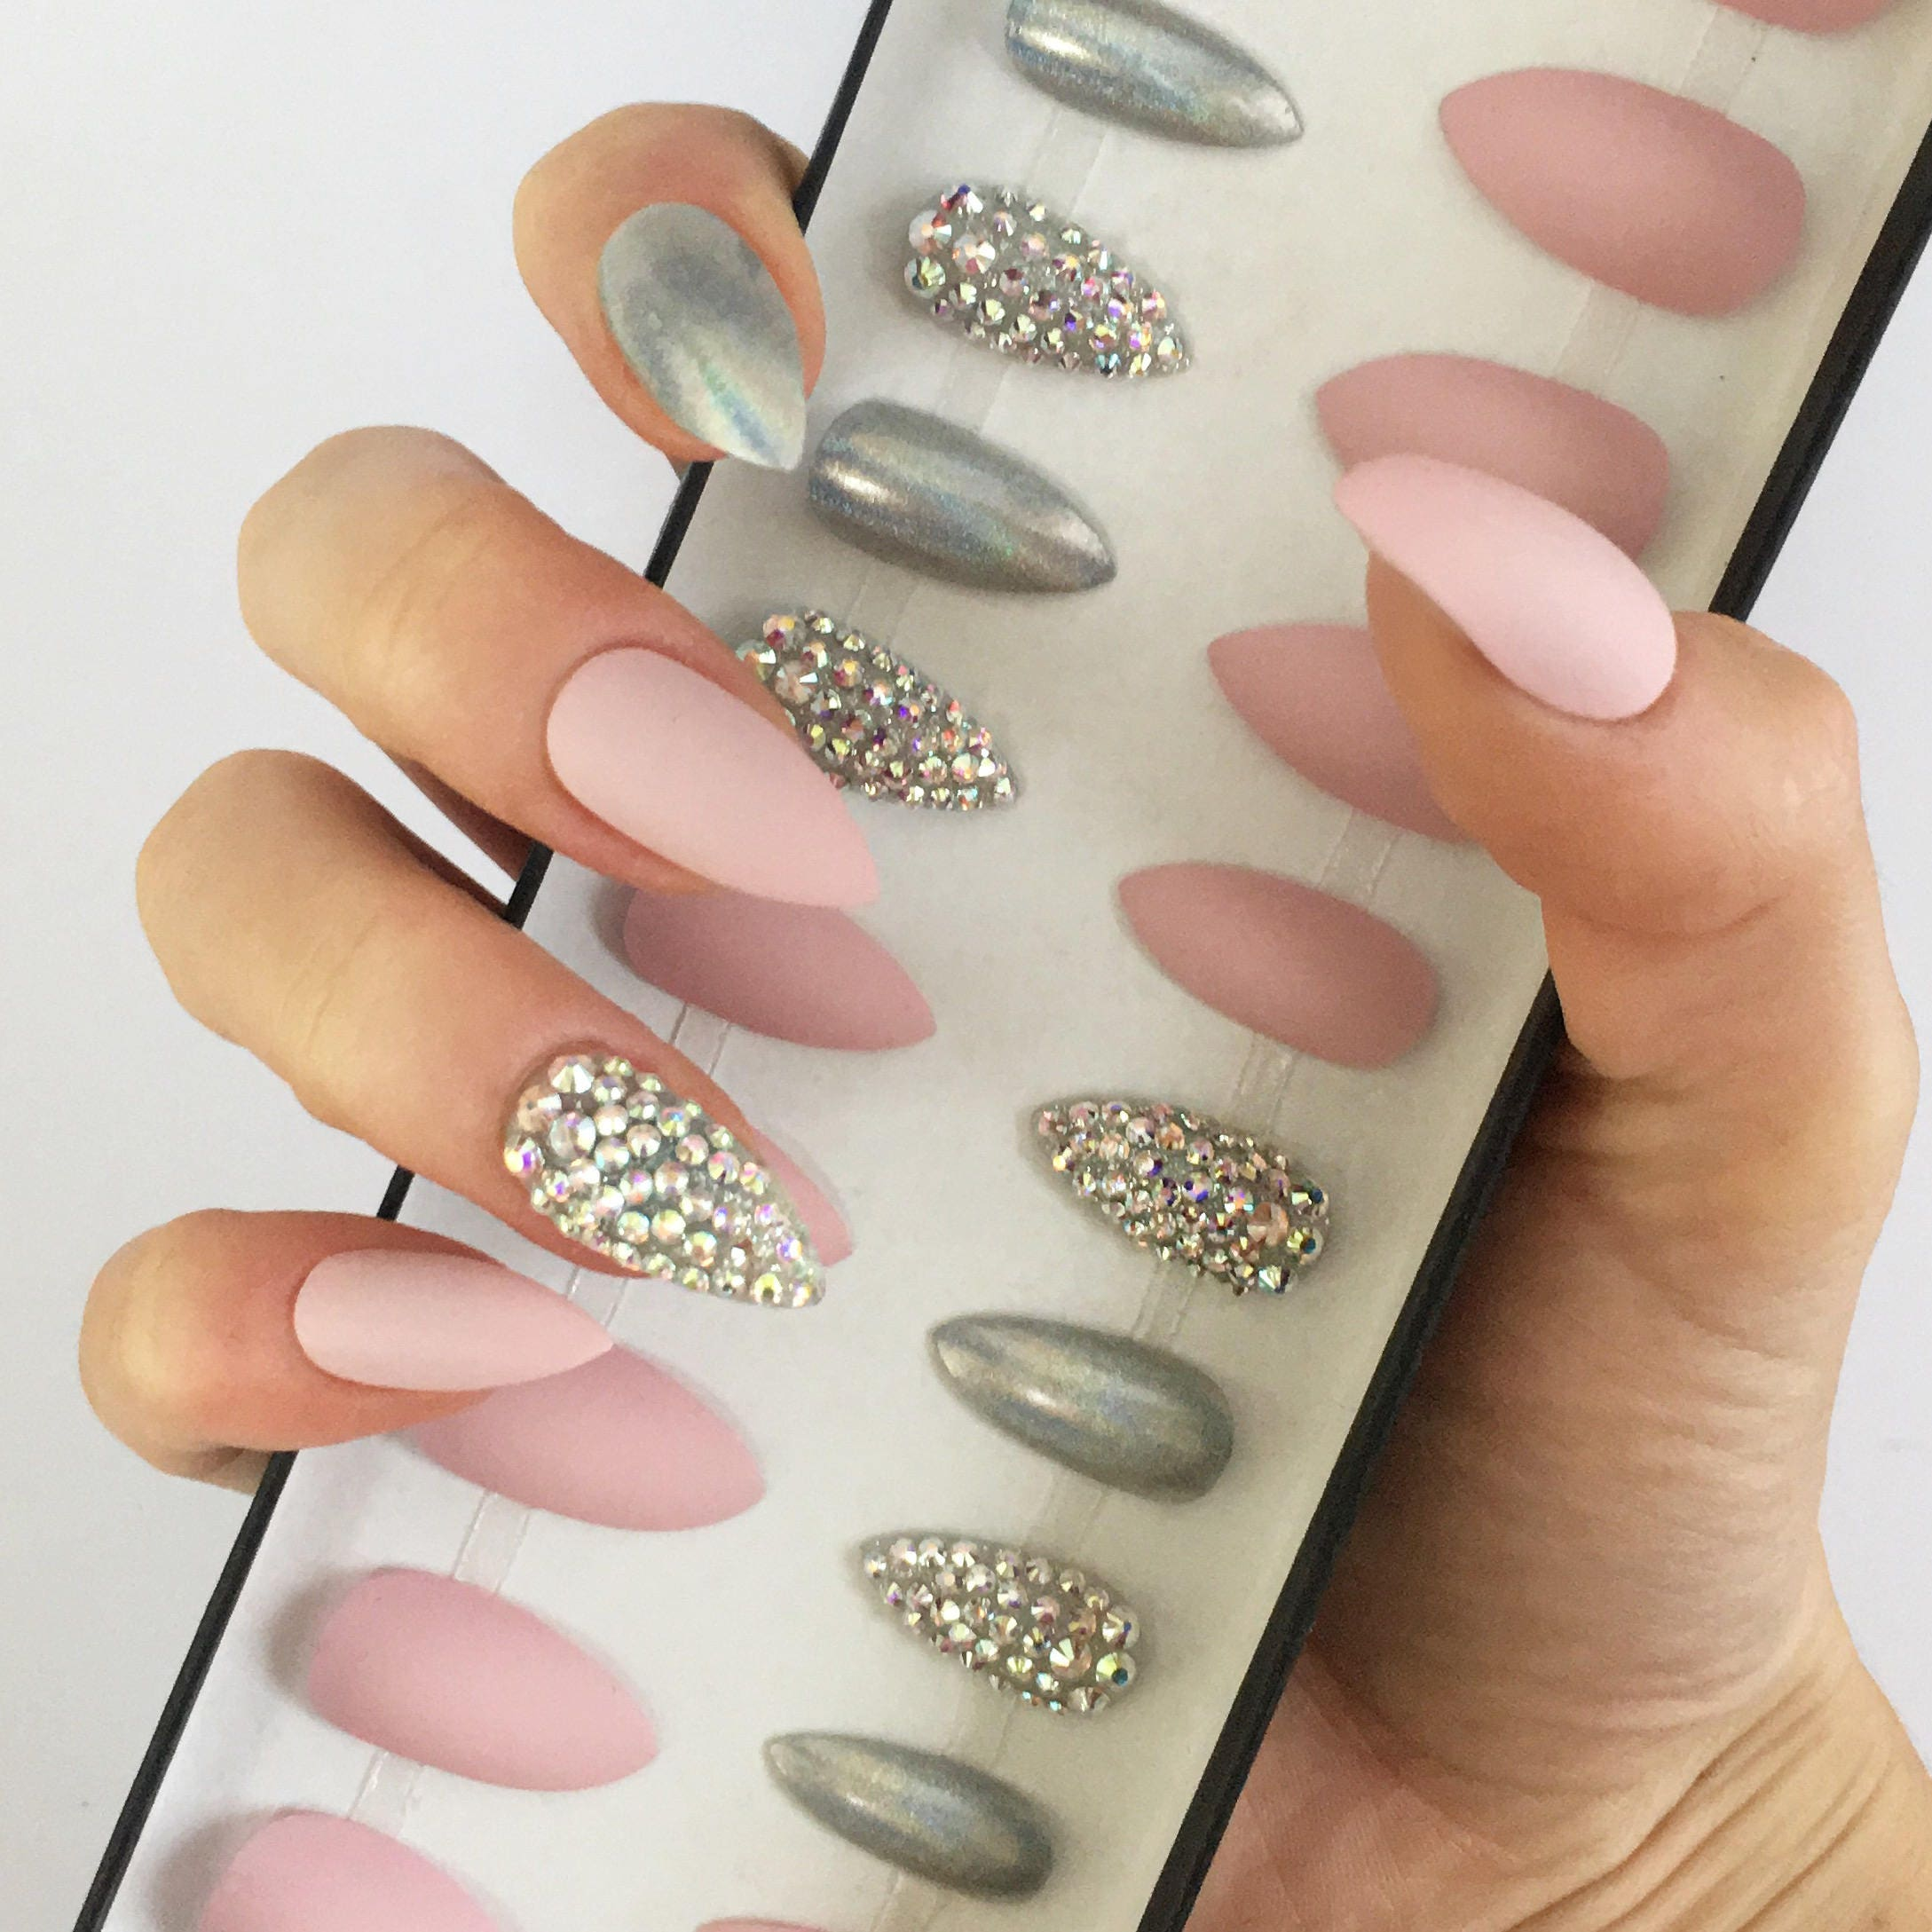 Pink press on nails Swarovski crystals stiletto nails